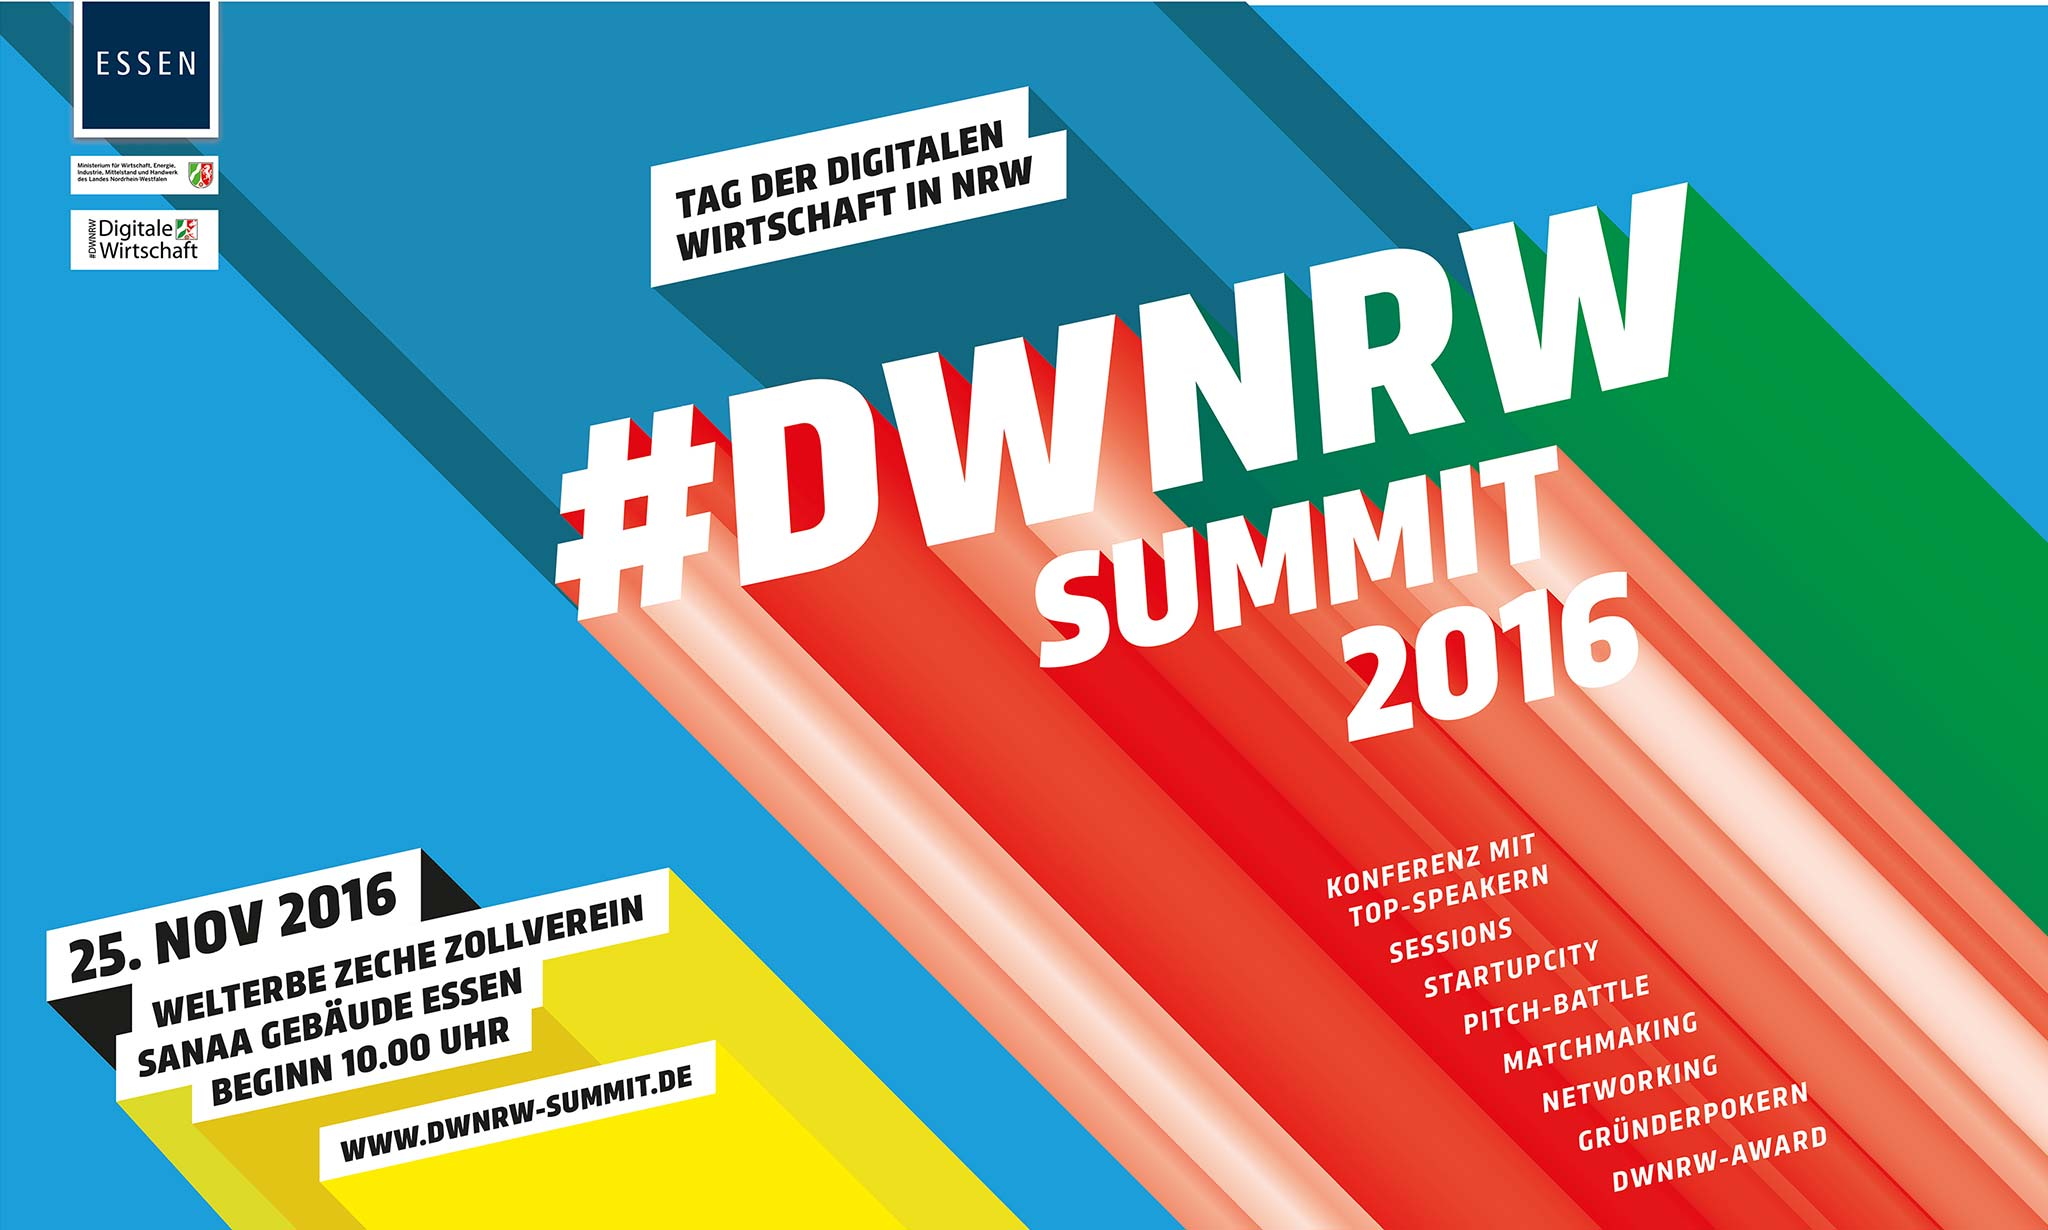 DWNRW Summit 2016